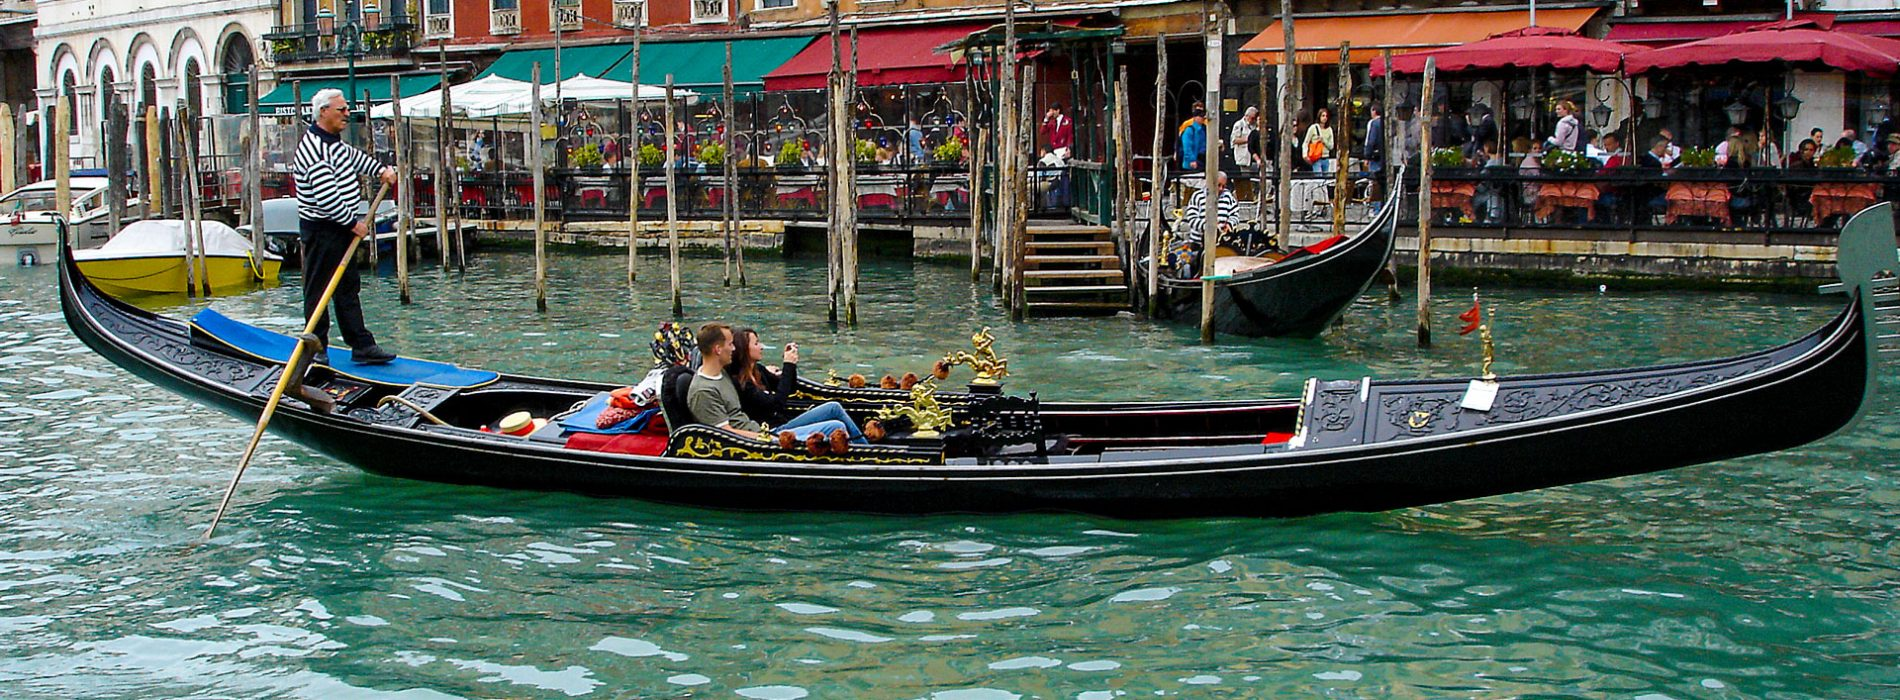 Gondola-Grand-Canal-header